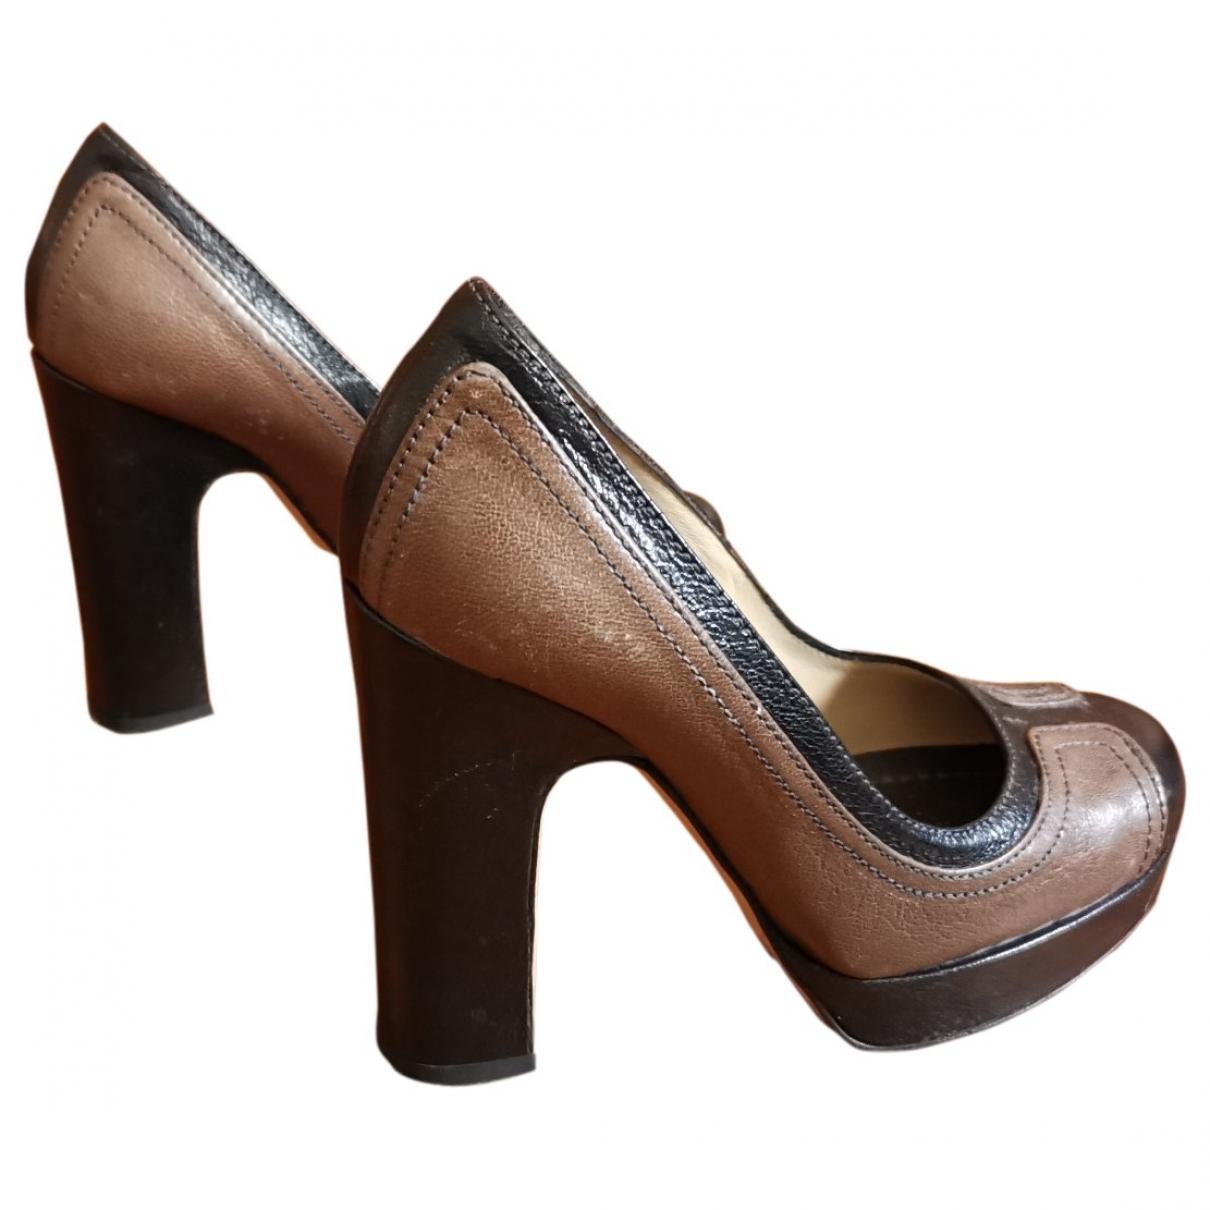 D&g \N Brown Leather Heels for Women 35 EU